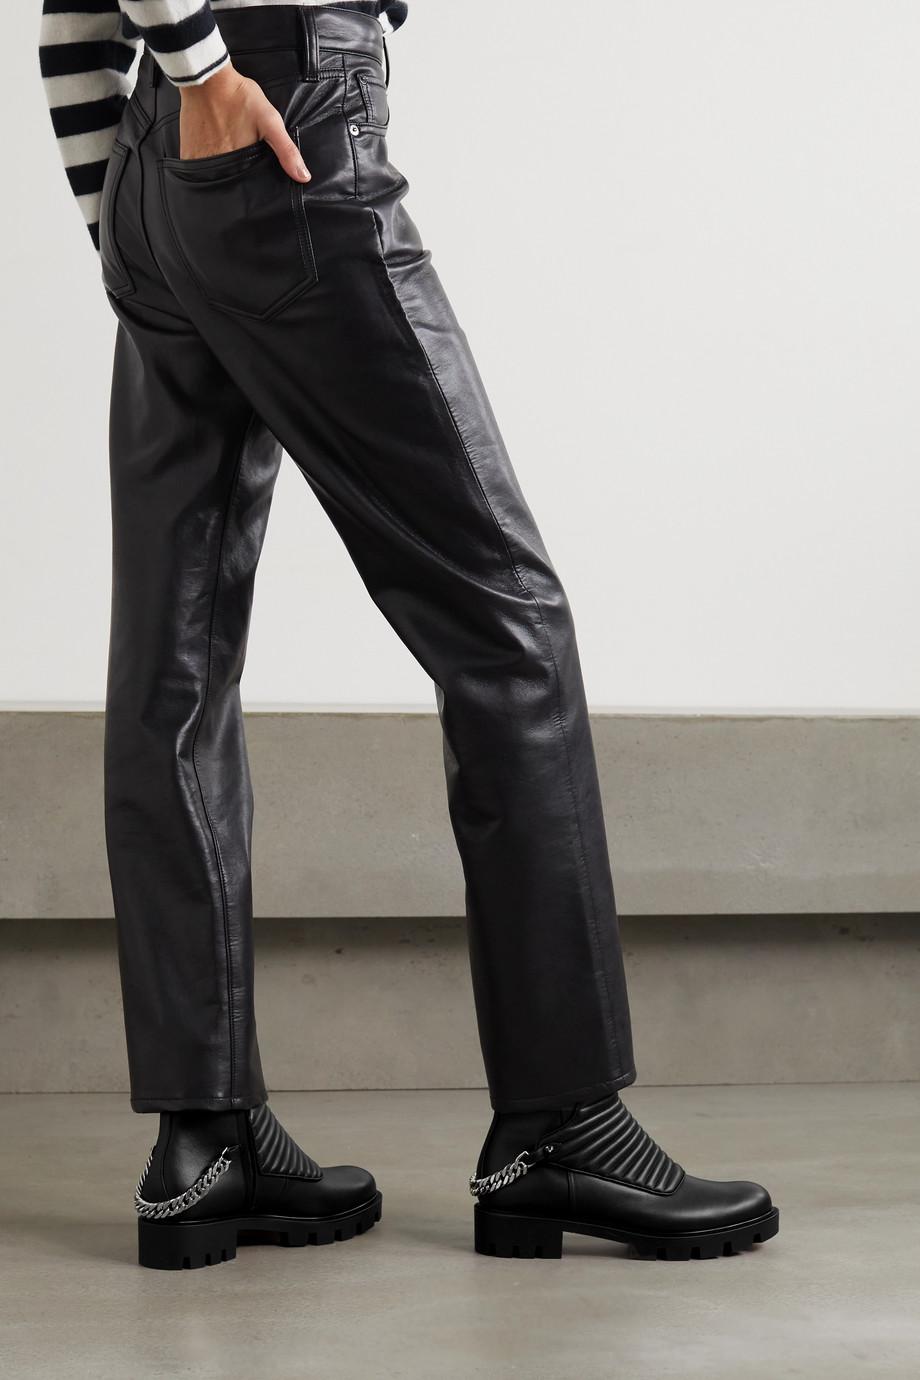 Christian Louboutin Maddic Max Ankle Boots aus gestepptem Leder mit Kette